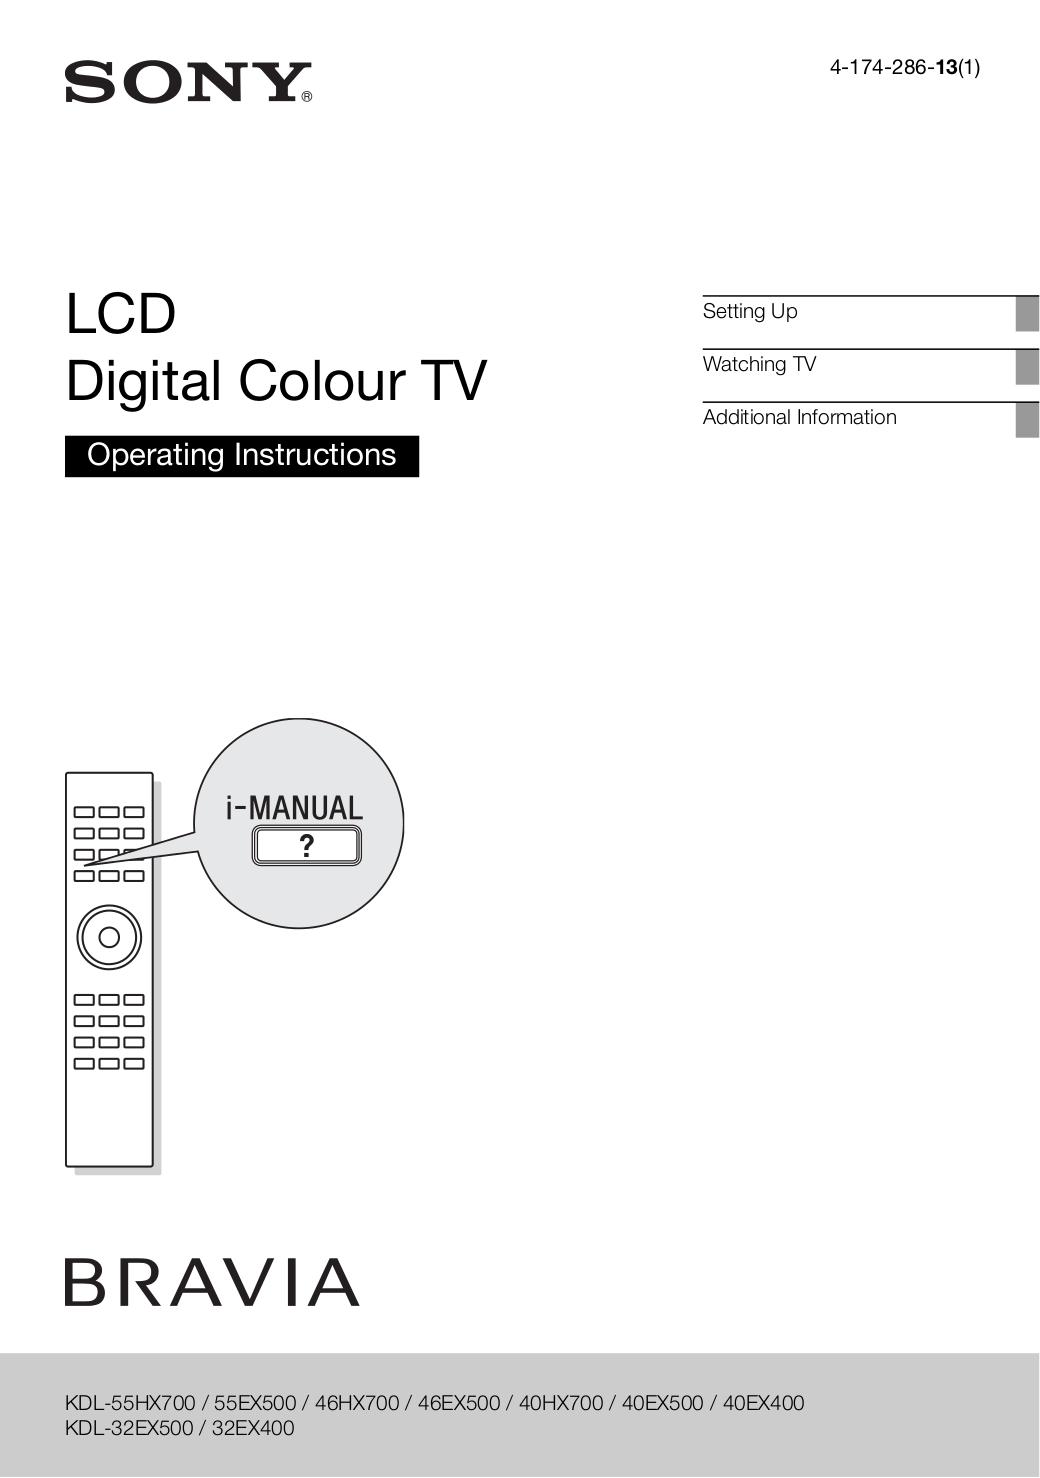 download free pdf for sony bravia kdl 55ex500 tv manual rh umlib com Sony Handycam Manual sony kdl-55ex500 manual pdf